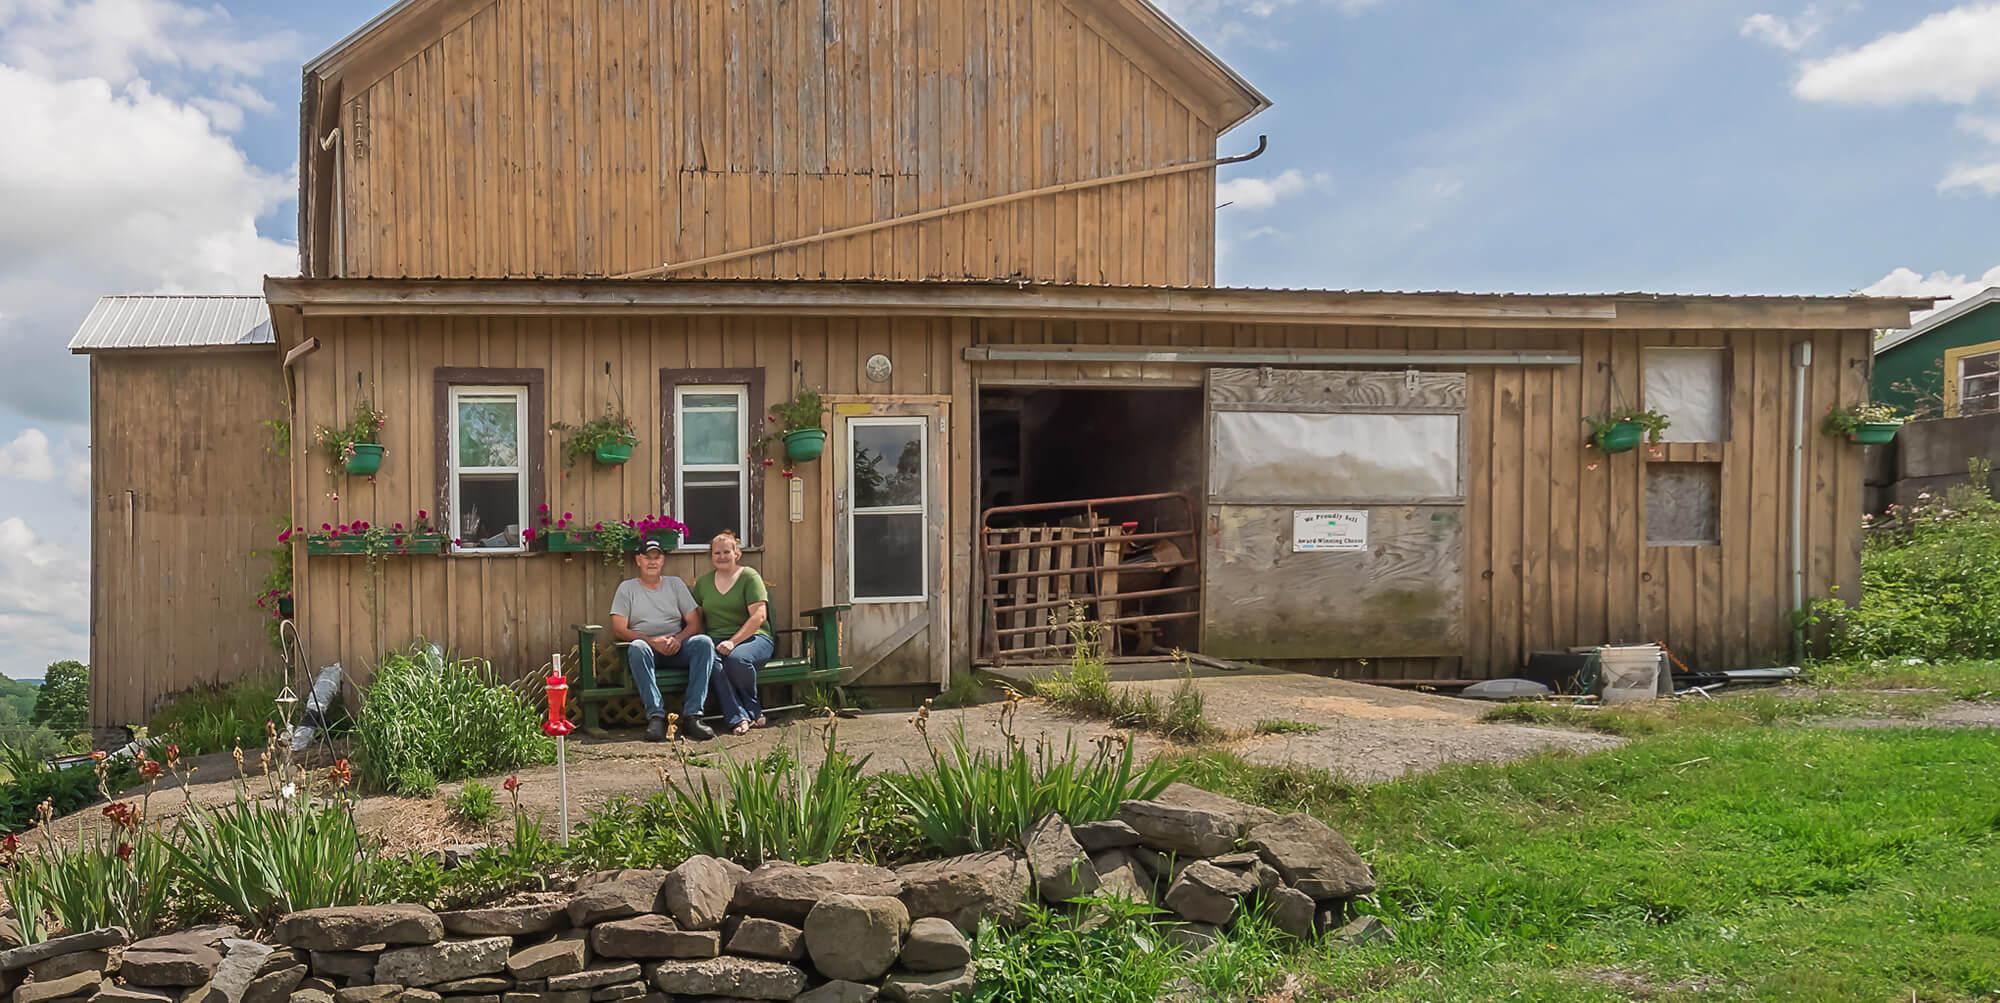 Antique Valley Farm barn image - Antique Valley Farm